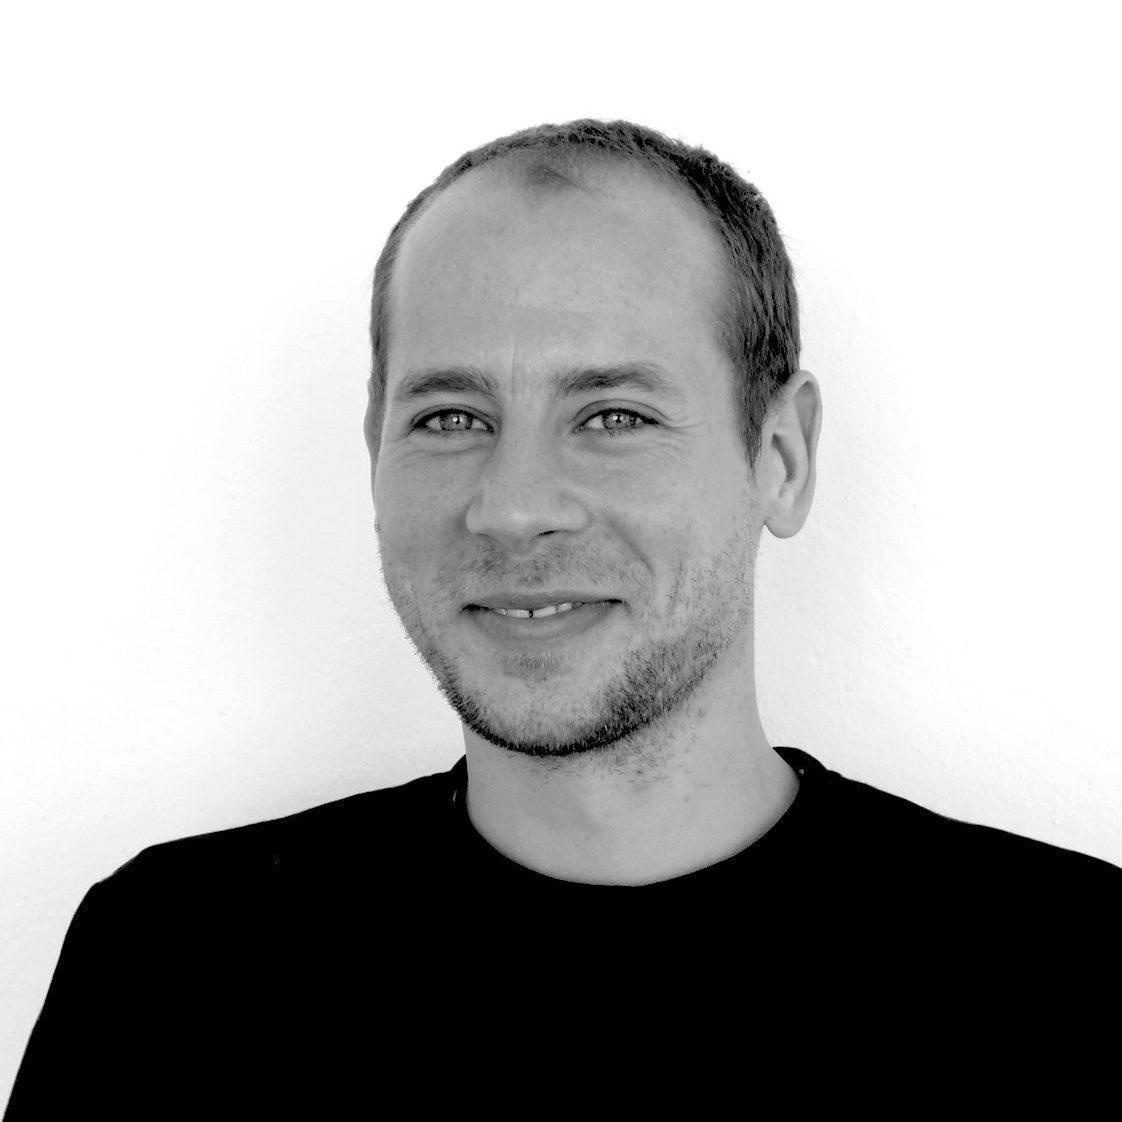 Daniel Schertel